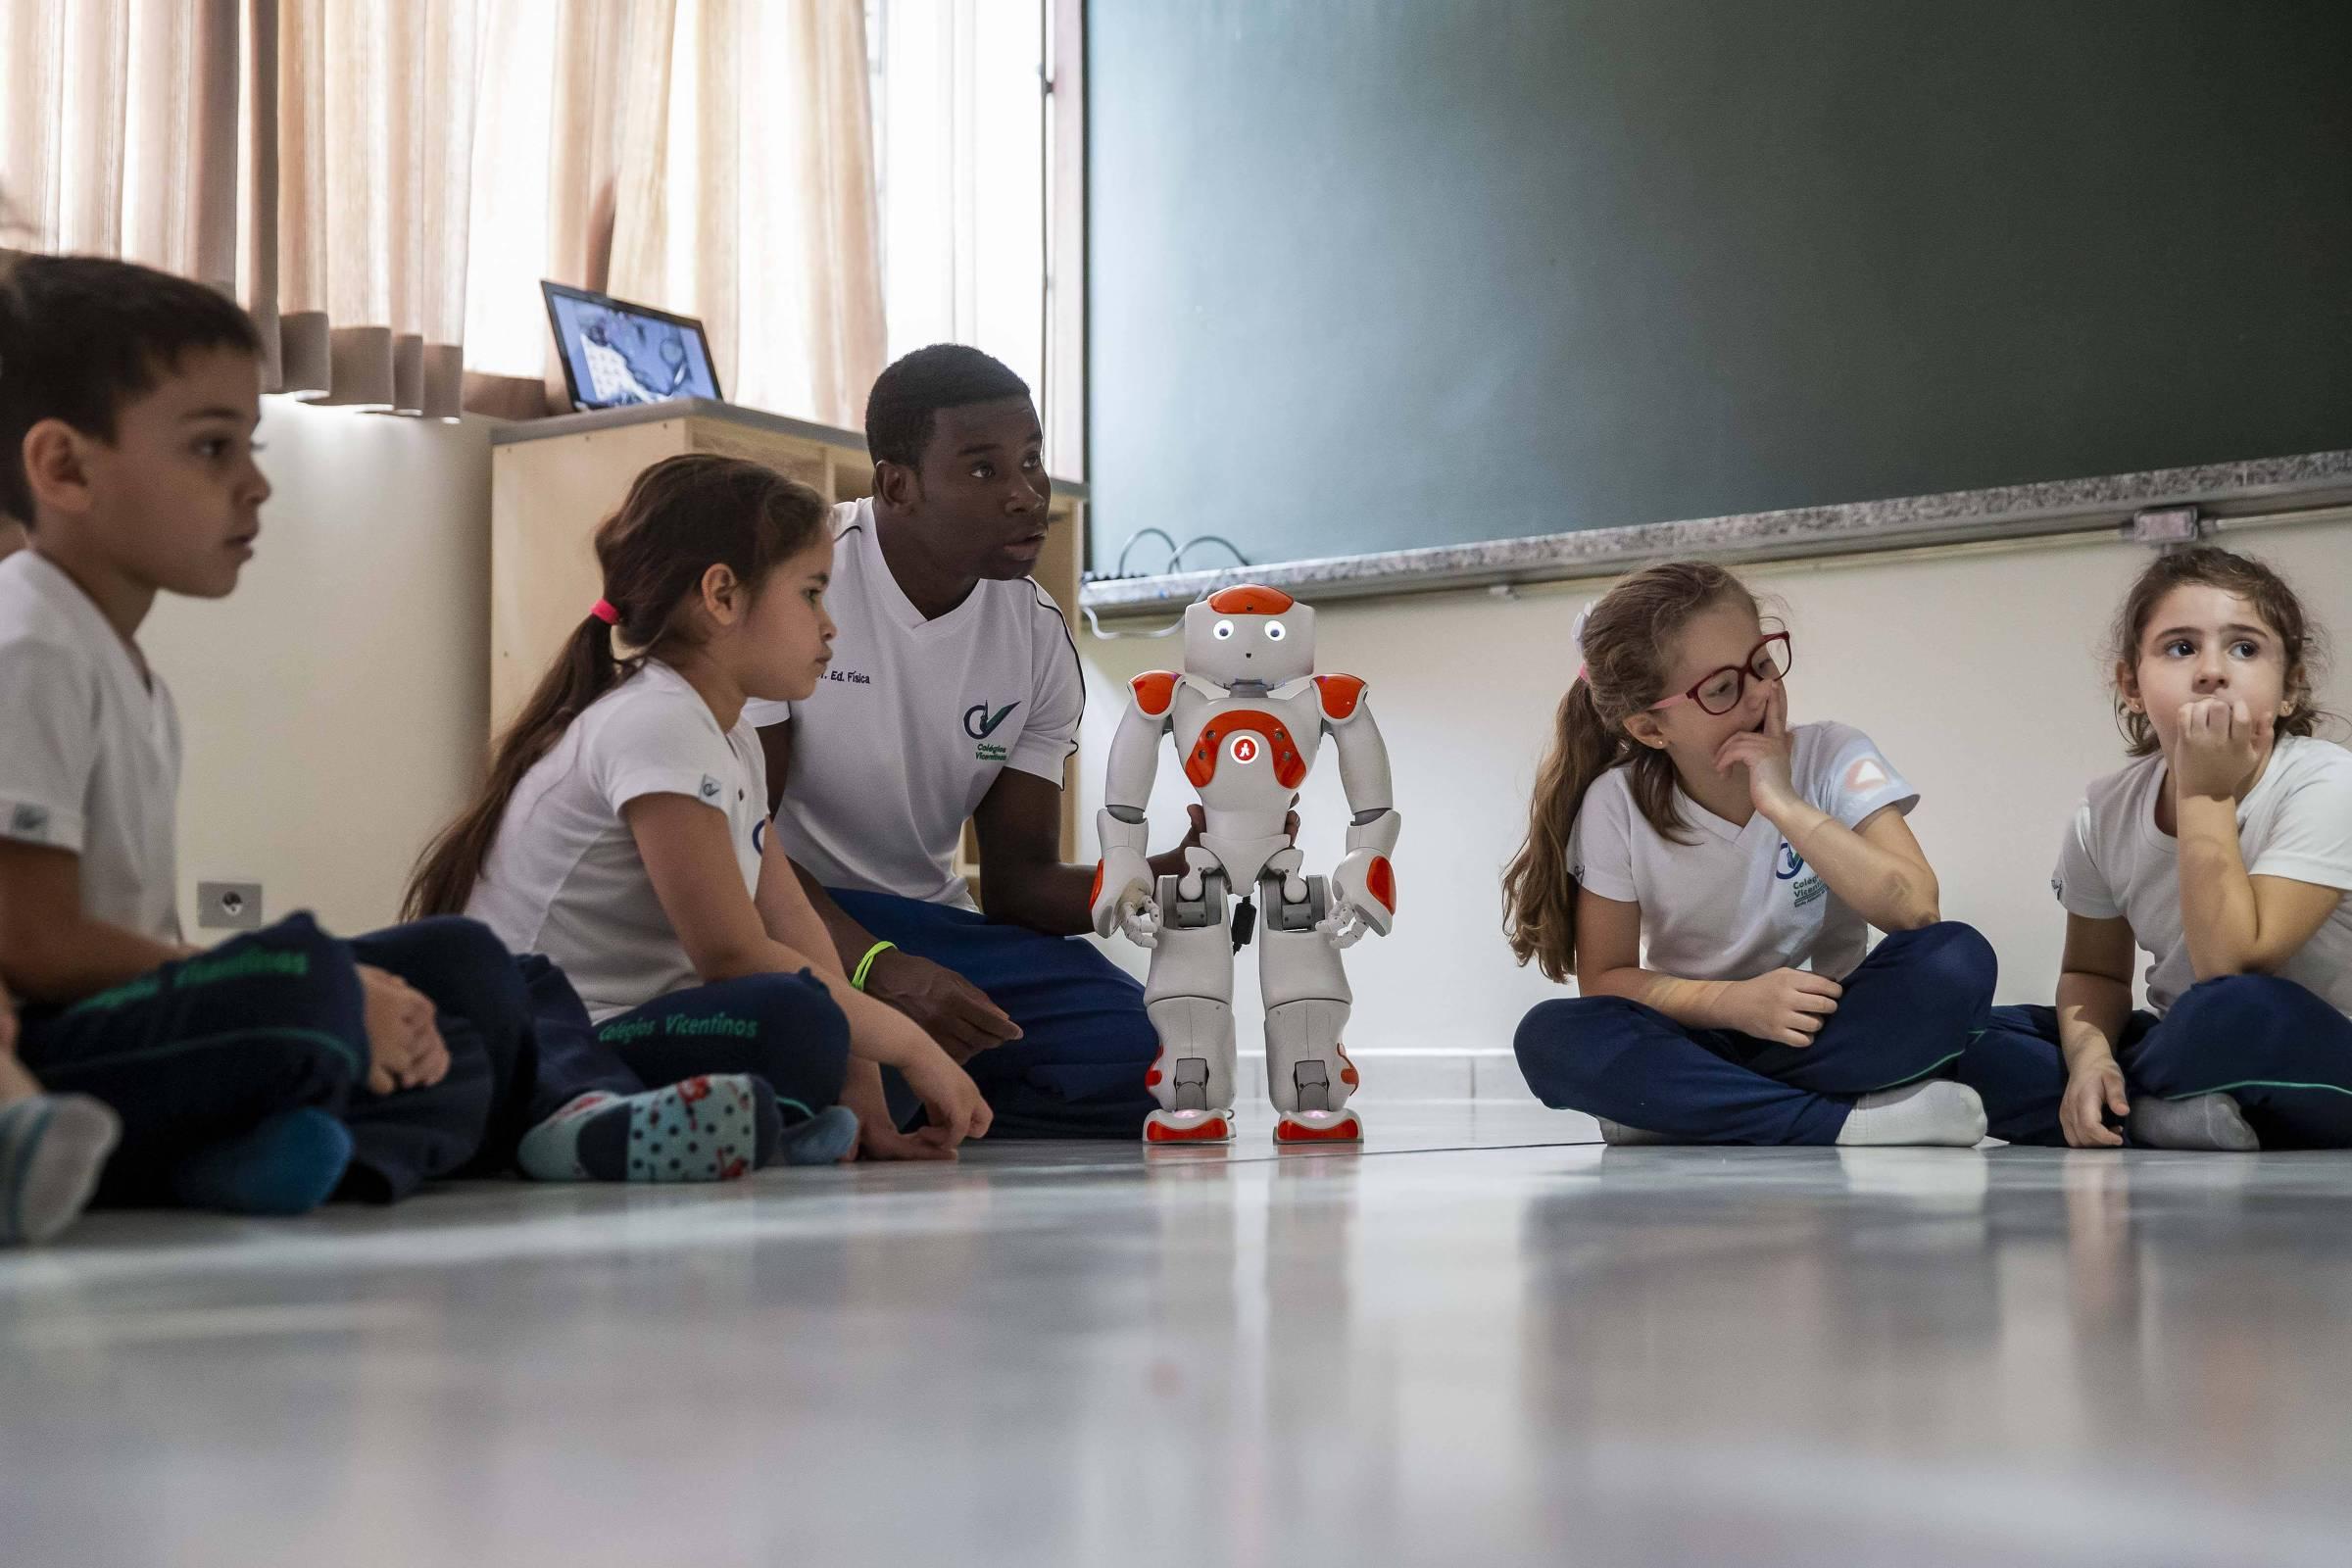 Governo reavalia estratégia para liberar ensino domiciliar